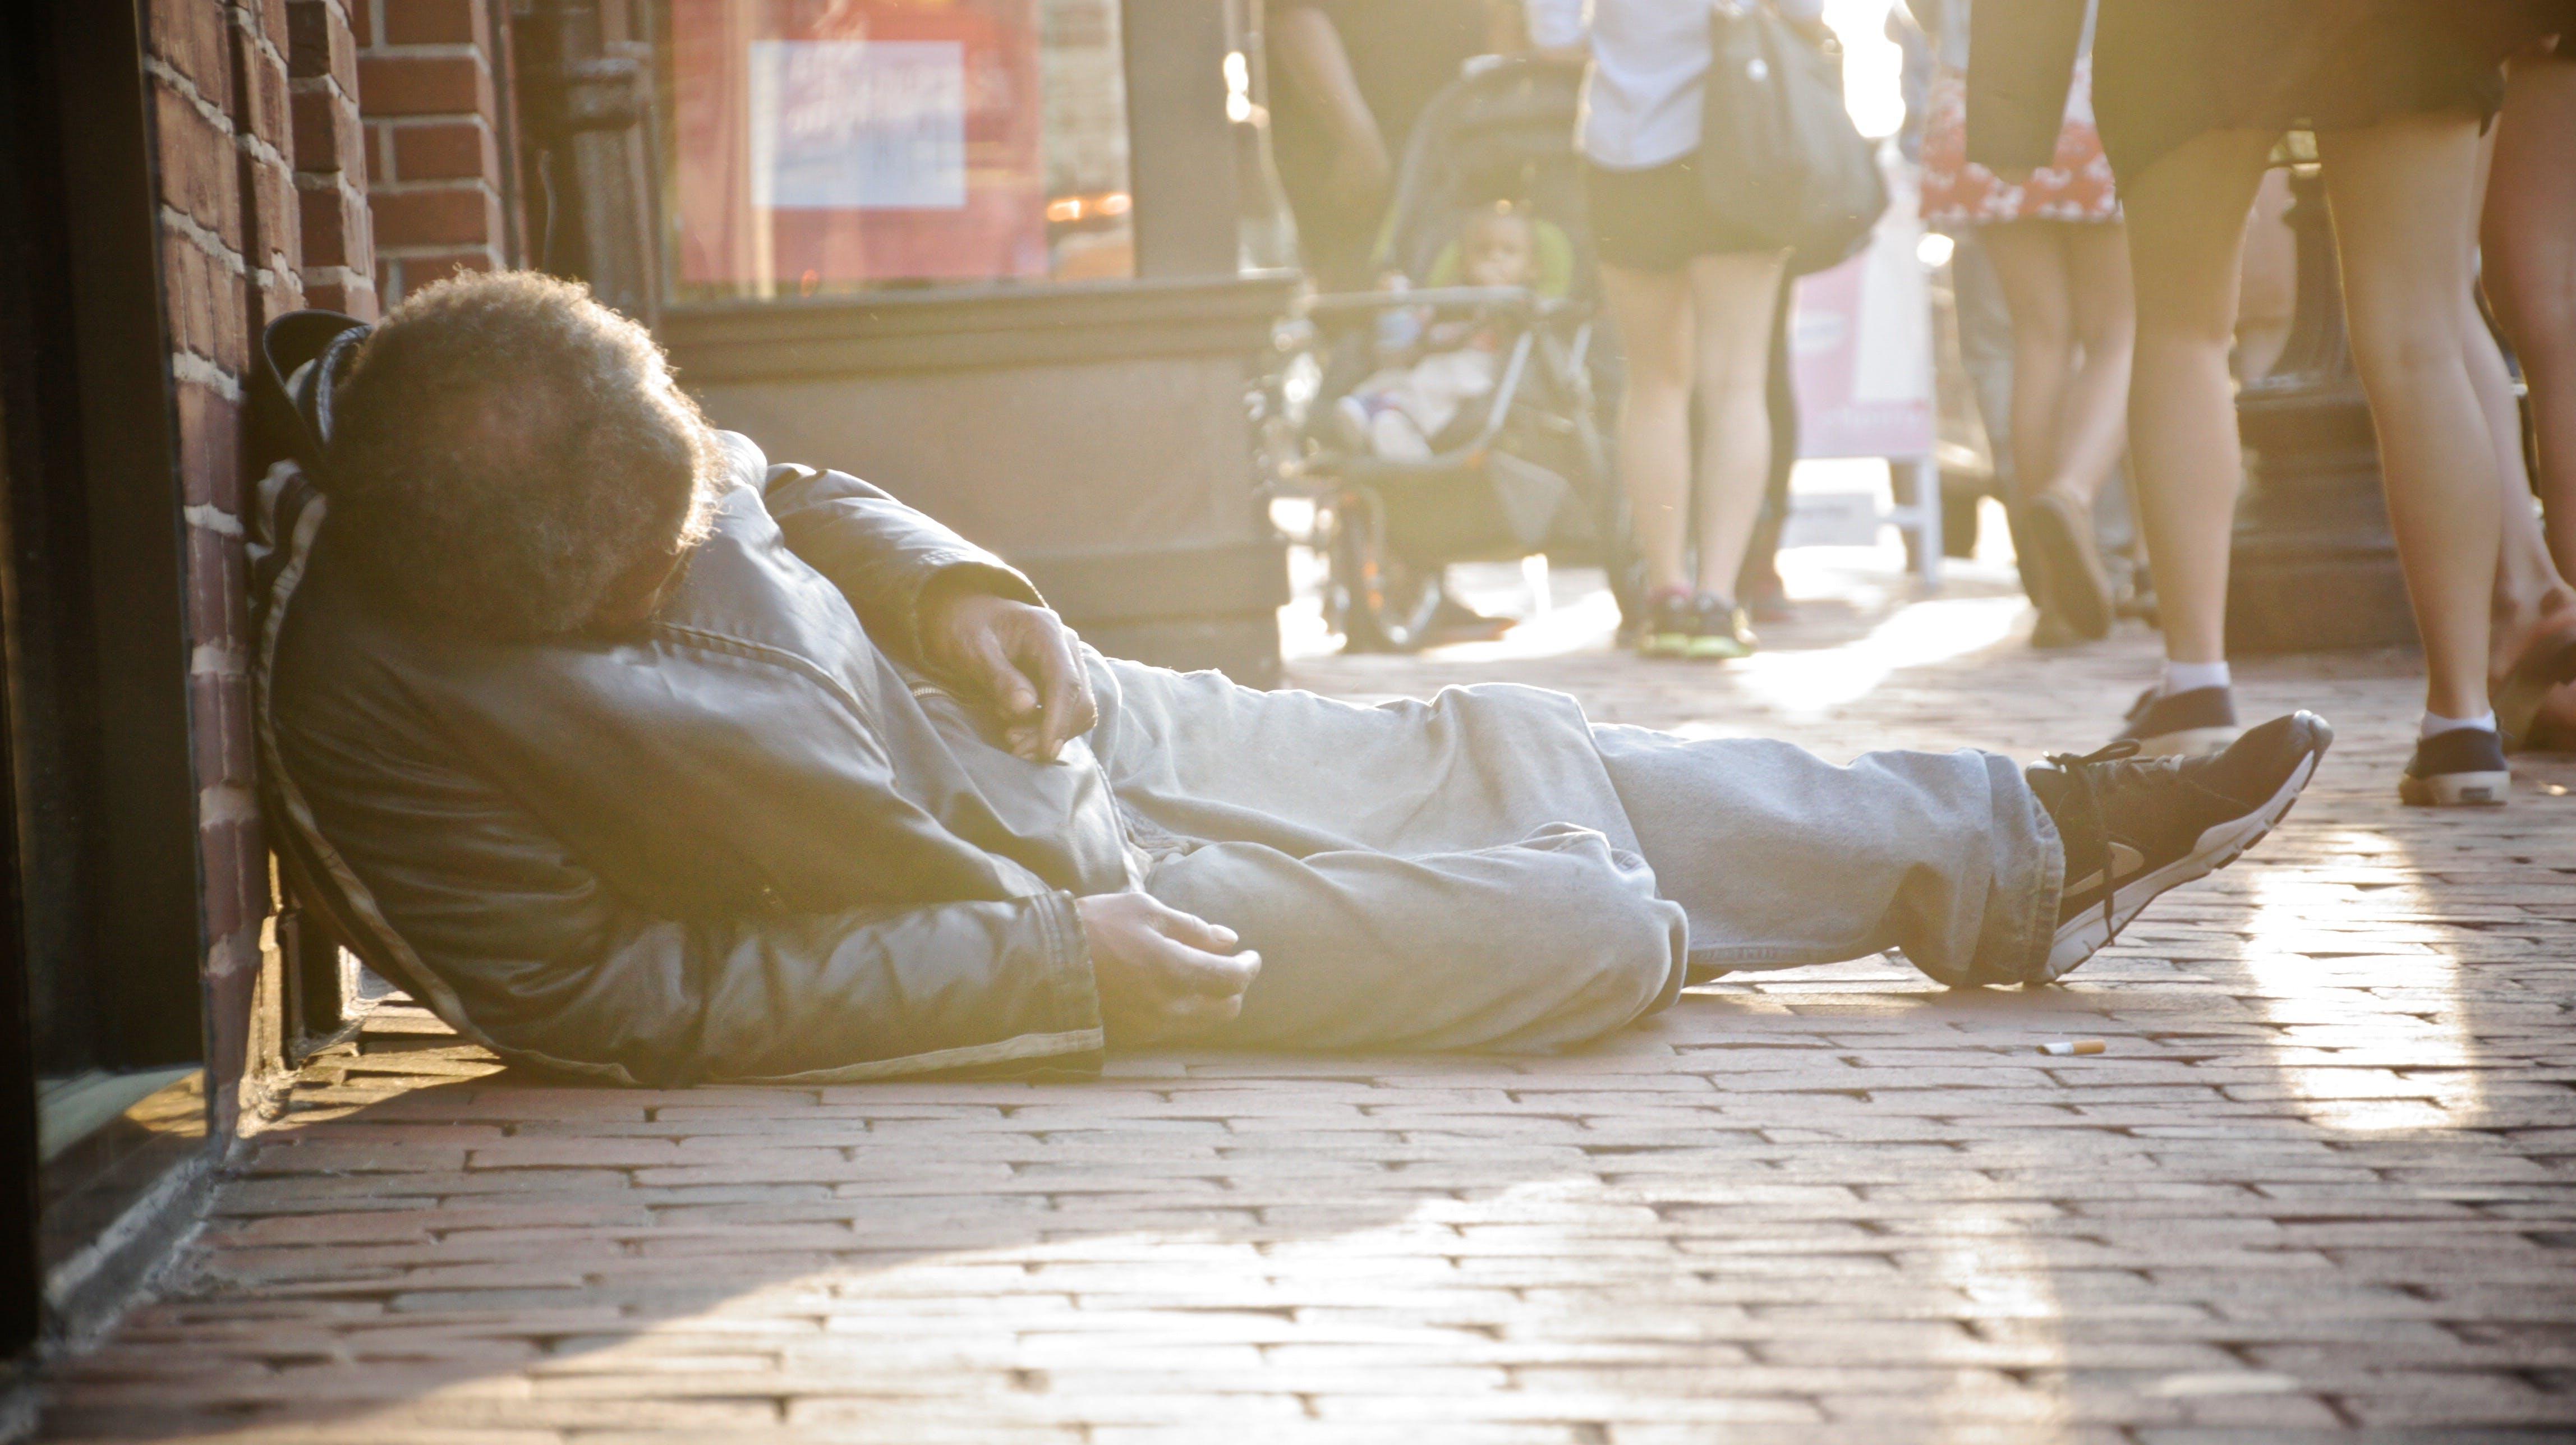 Free stock photo of homeless